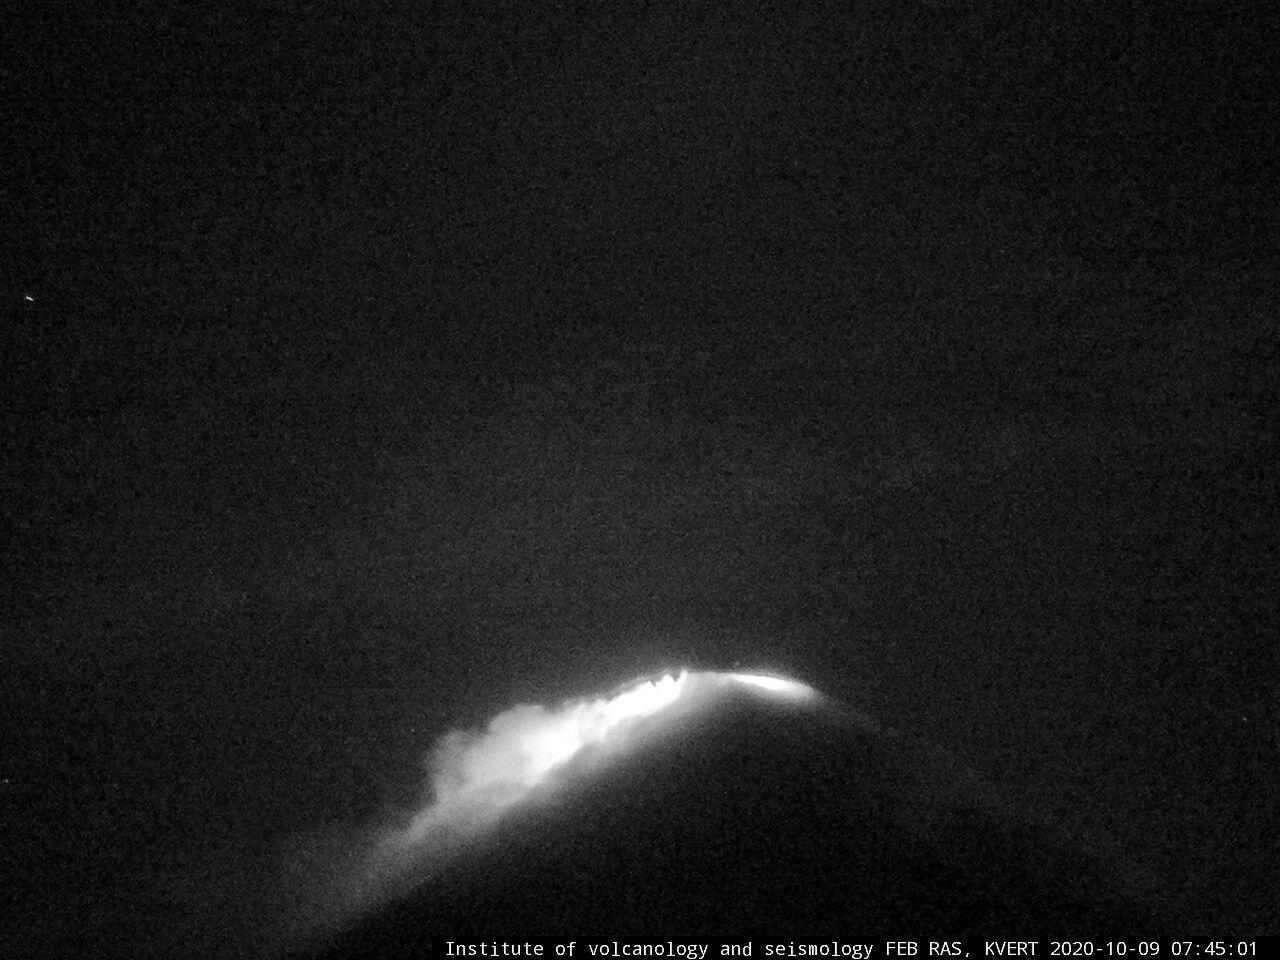 Klyuchevskoy - 09.10.2020 / 7.45am - View from F.Yu. Levinson-Lessing Kamchatkan Volcanological Station - IVS, FEB, RAS / KVERT